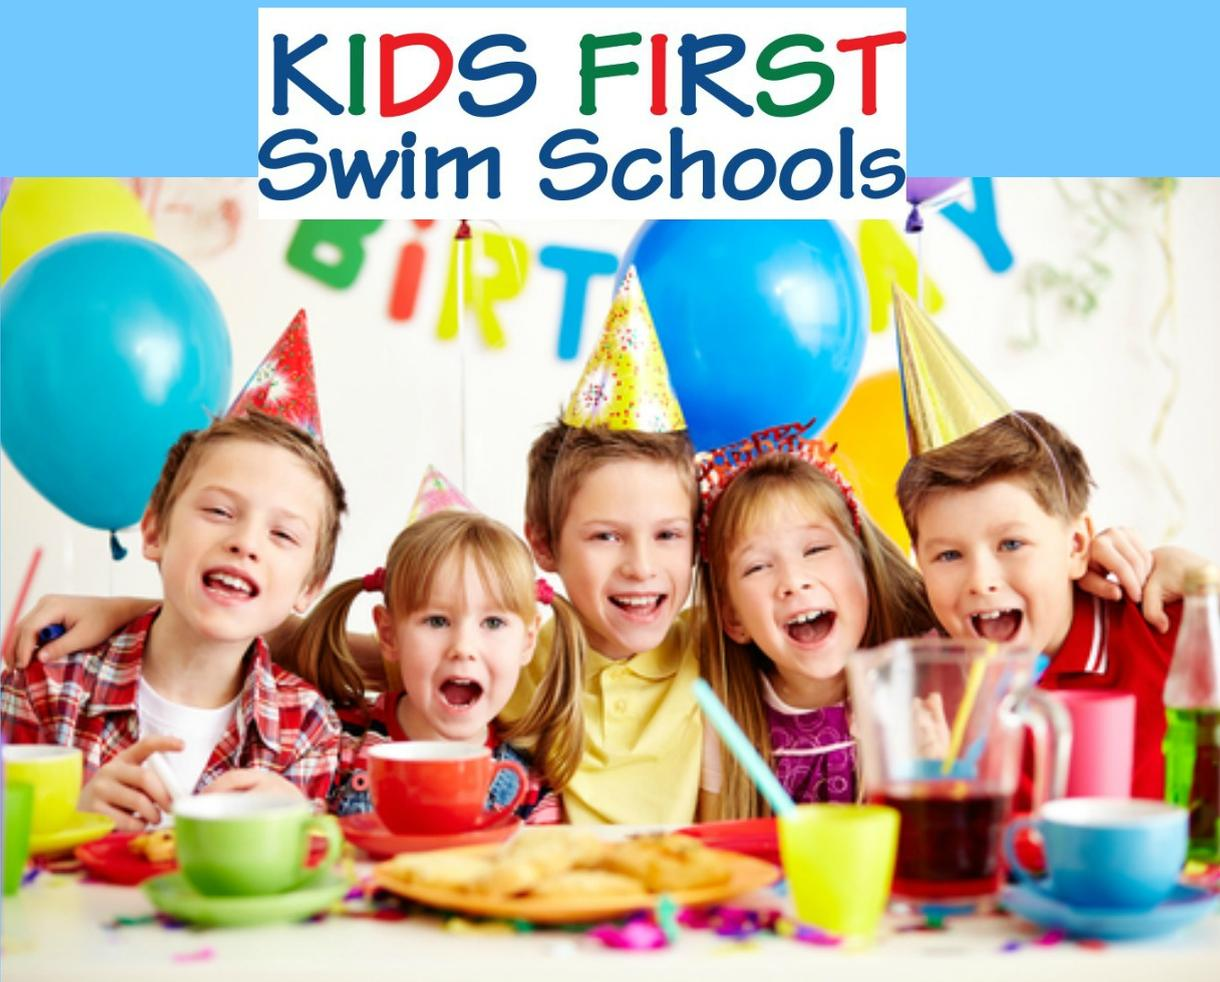 Kids First Swim Schools Birthday Splash Party!